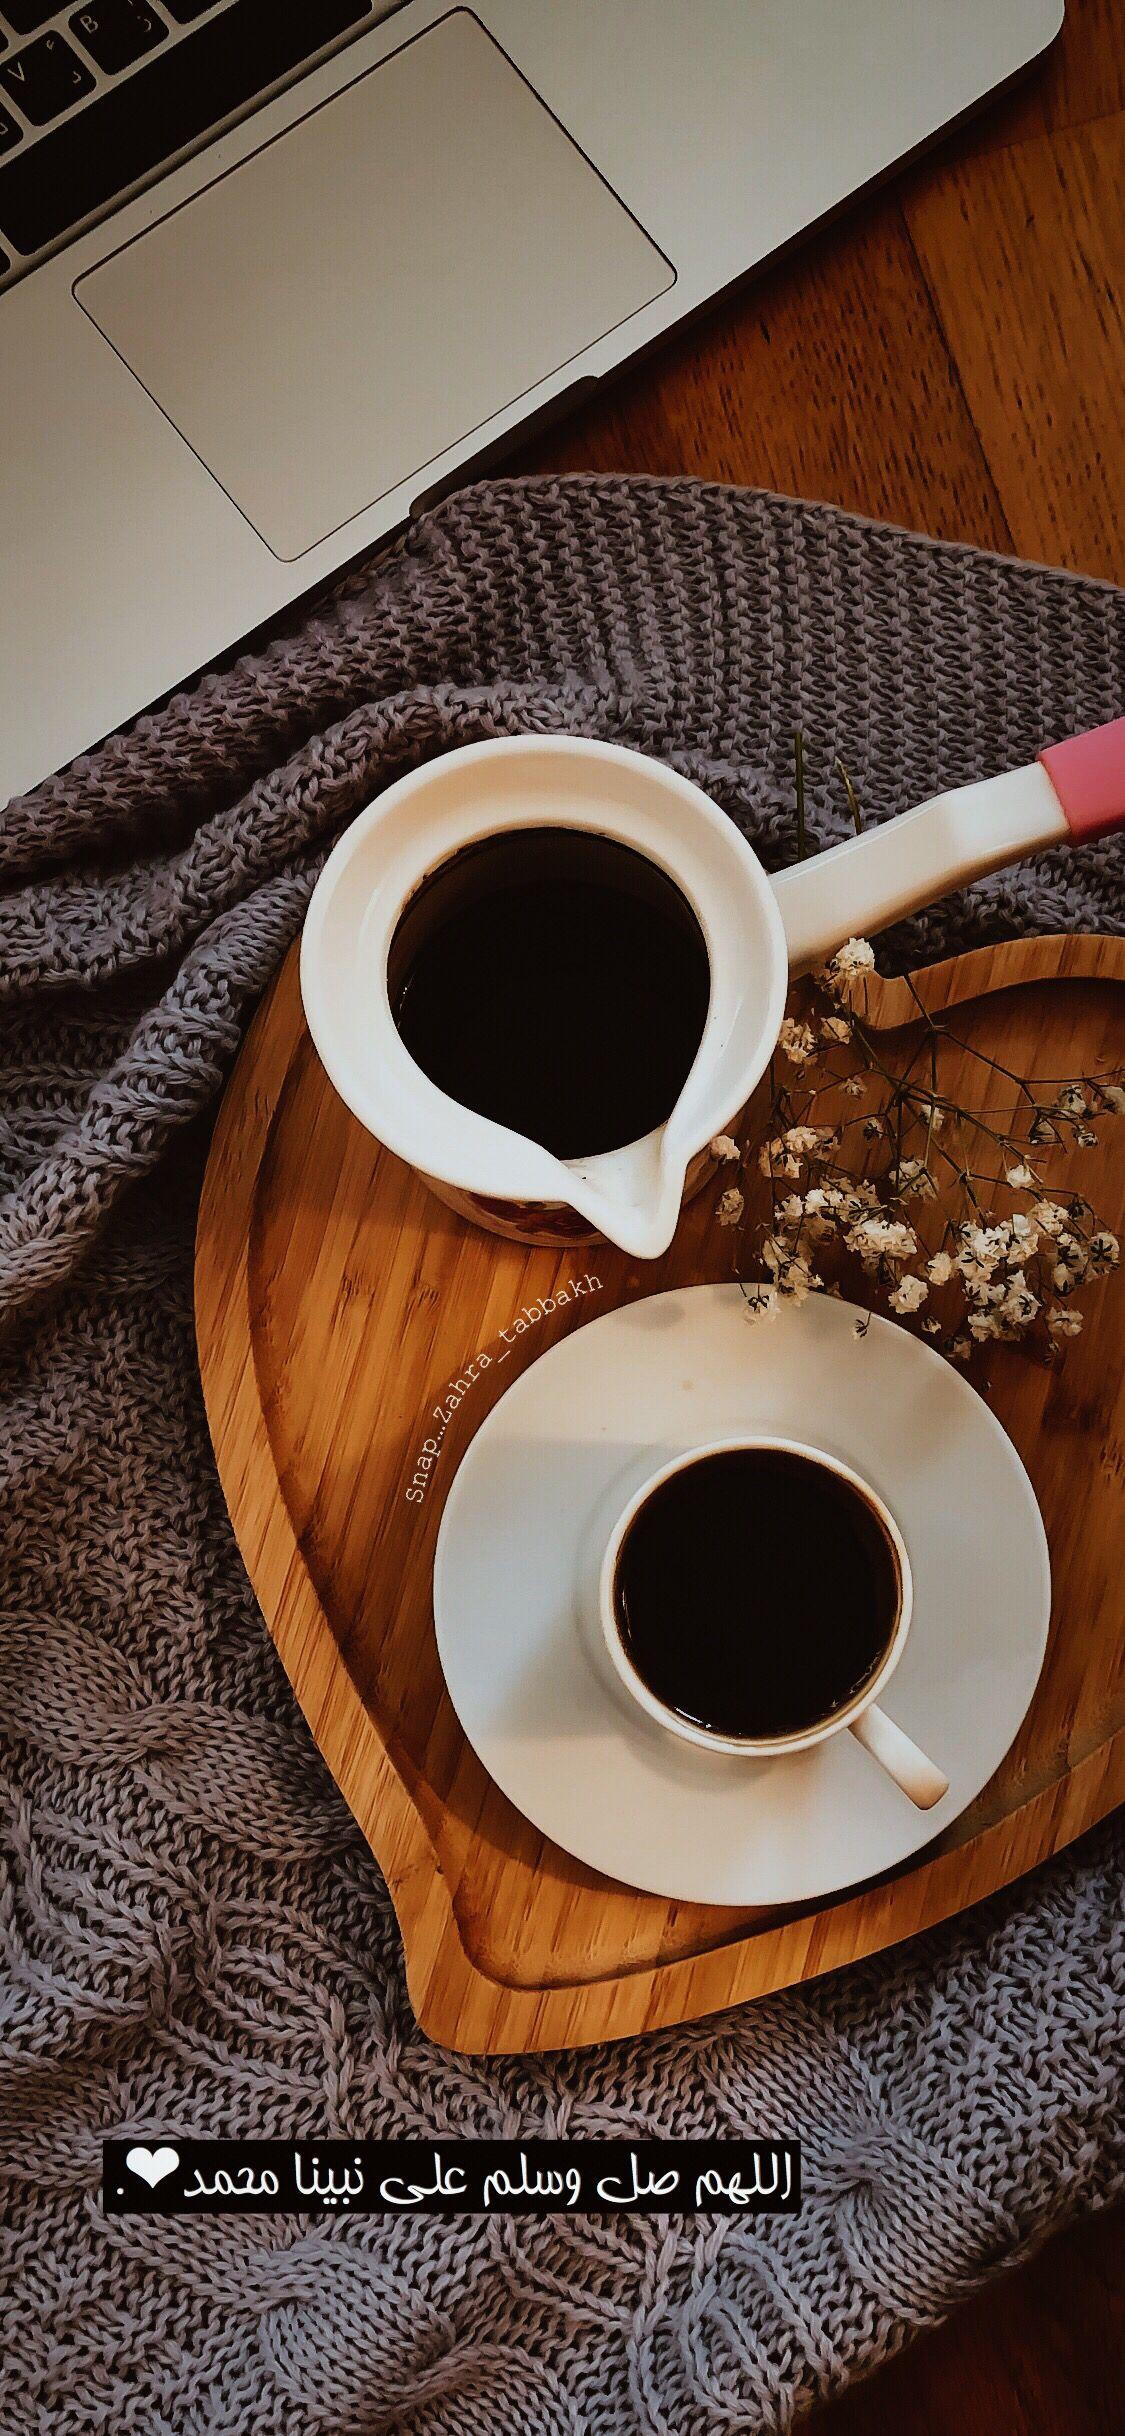 Pin By Ameel On Allah French Roast Coffee Coffee Roasting Fresh Roasted Coffee